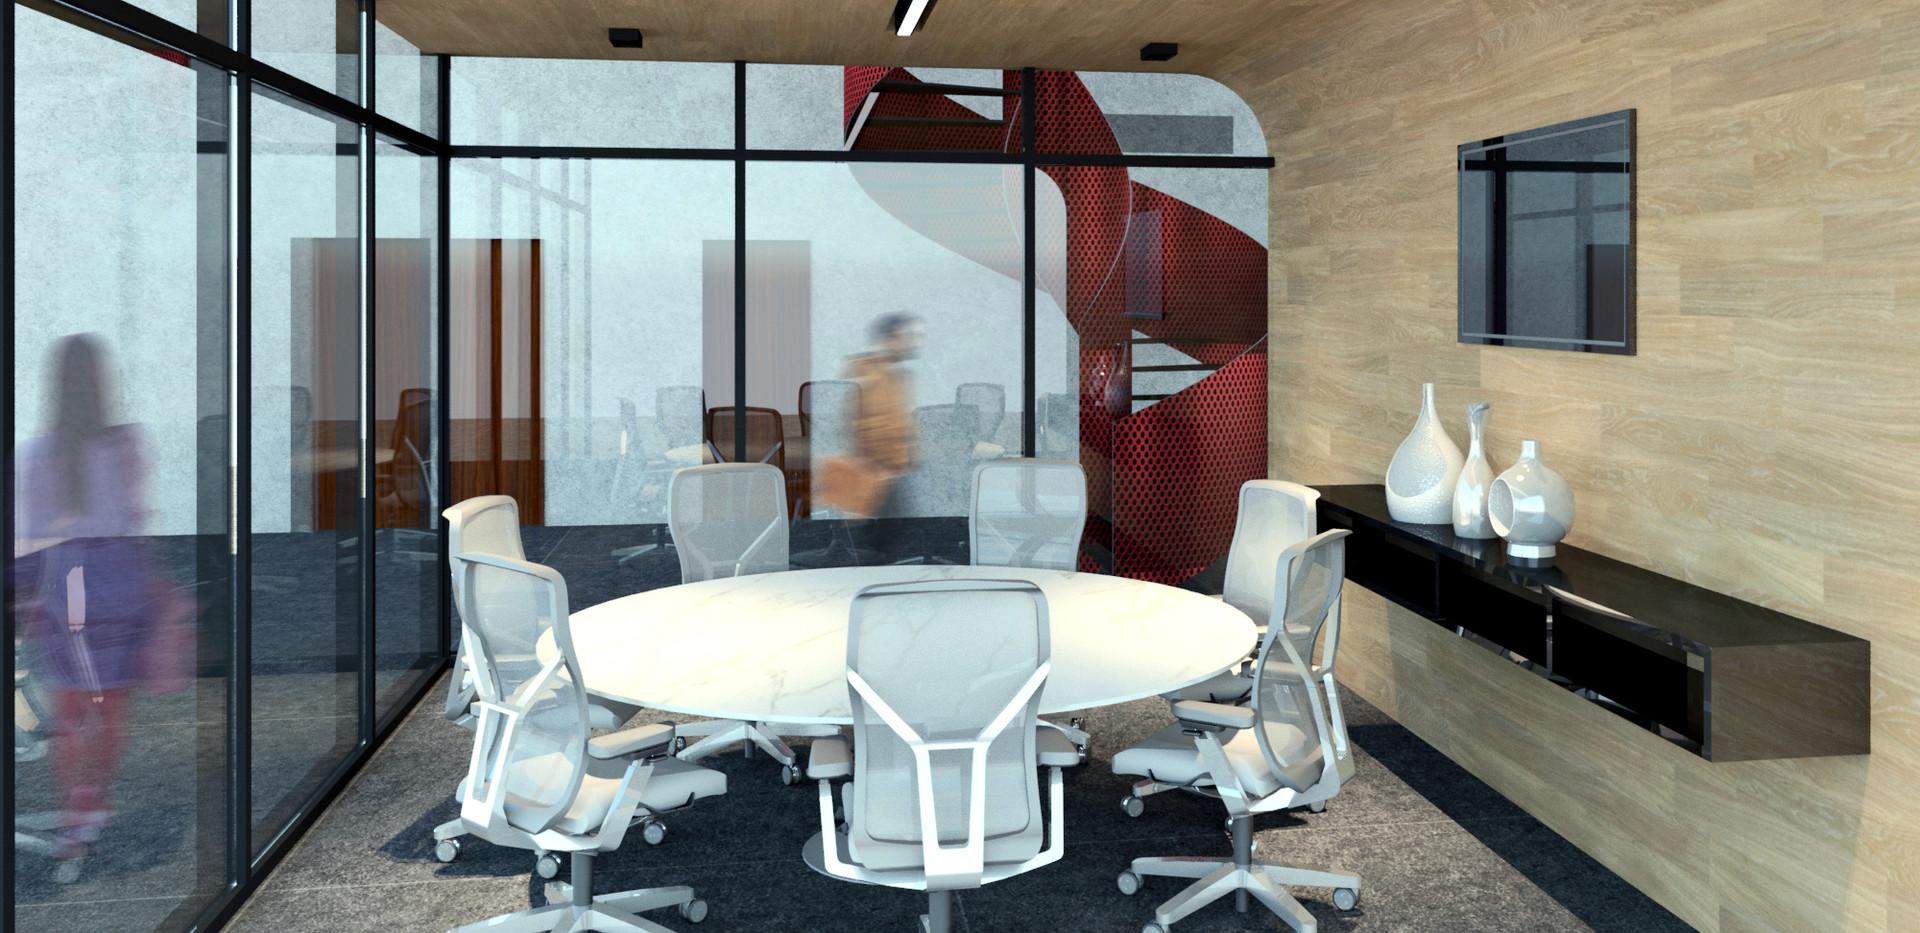 TF Meeting Room